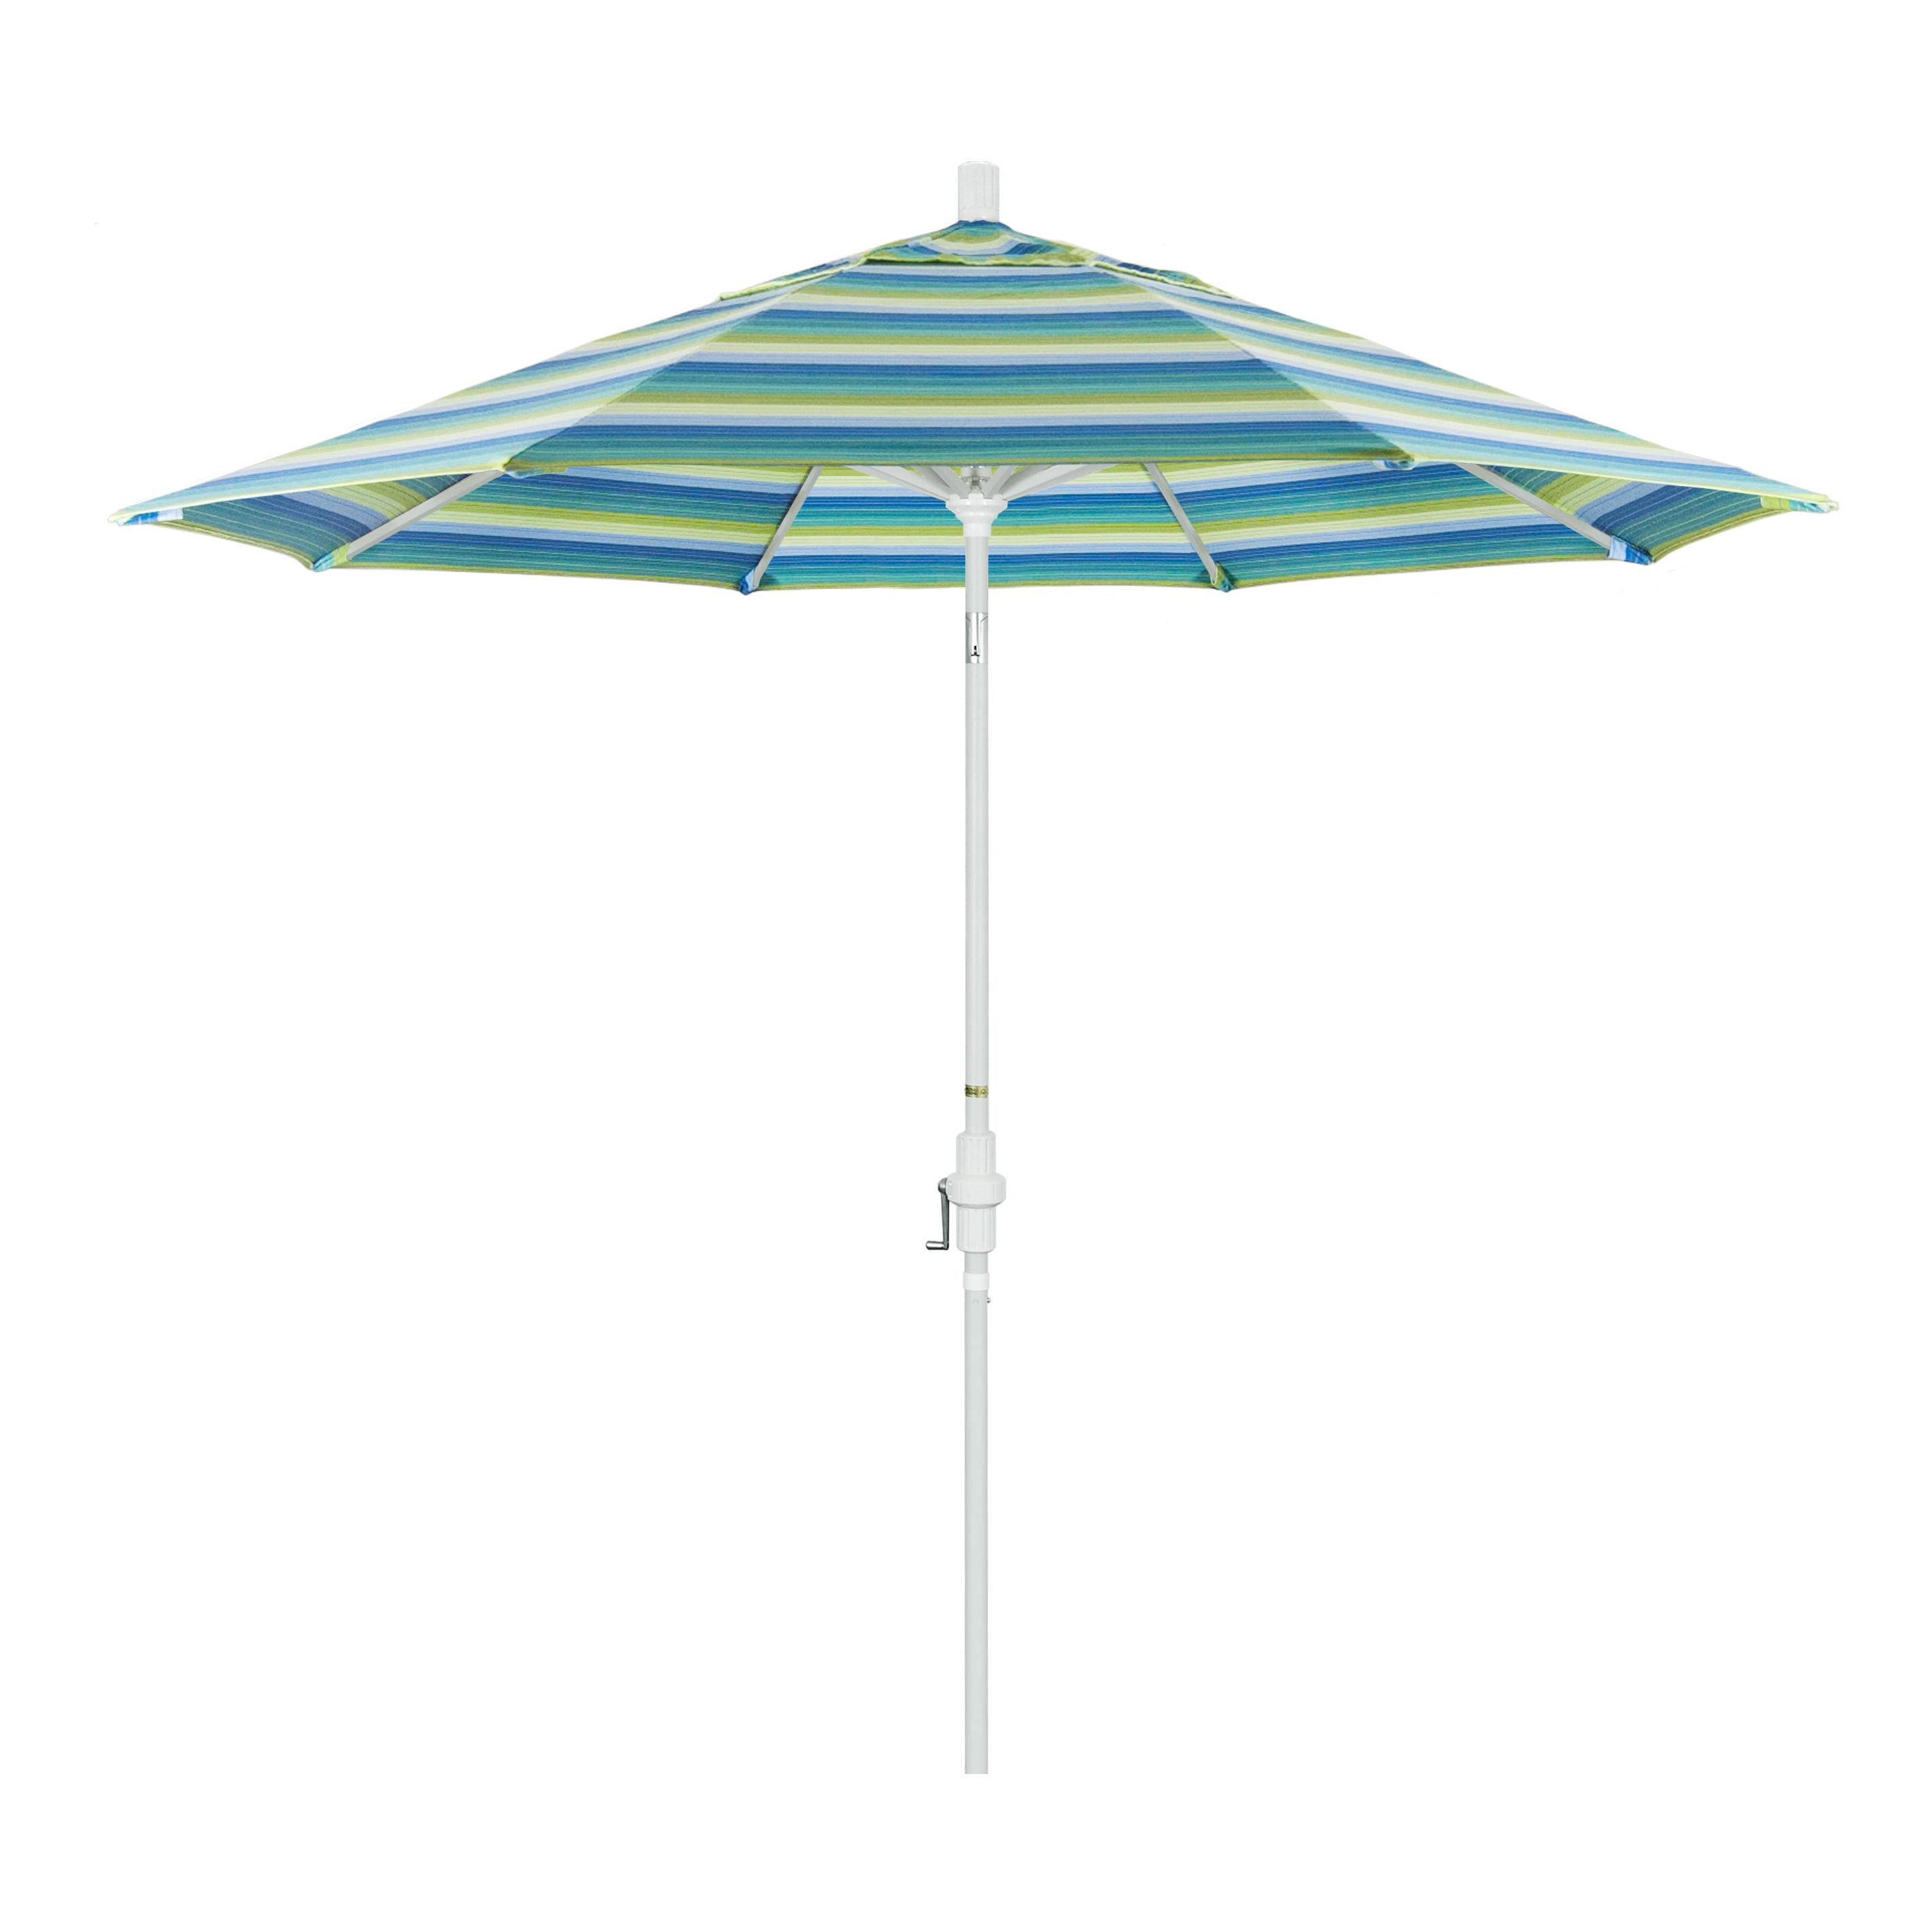 Most Recent Wallach Market Sunbrella Umbrellas Within Golden State Series 9' Market Sunbrella Umbrella (Gallery 7 of 20)